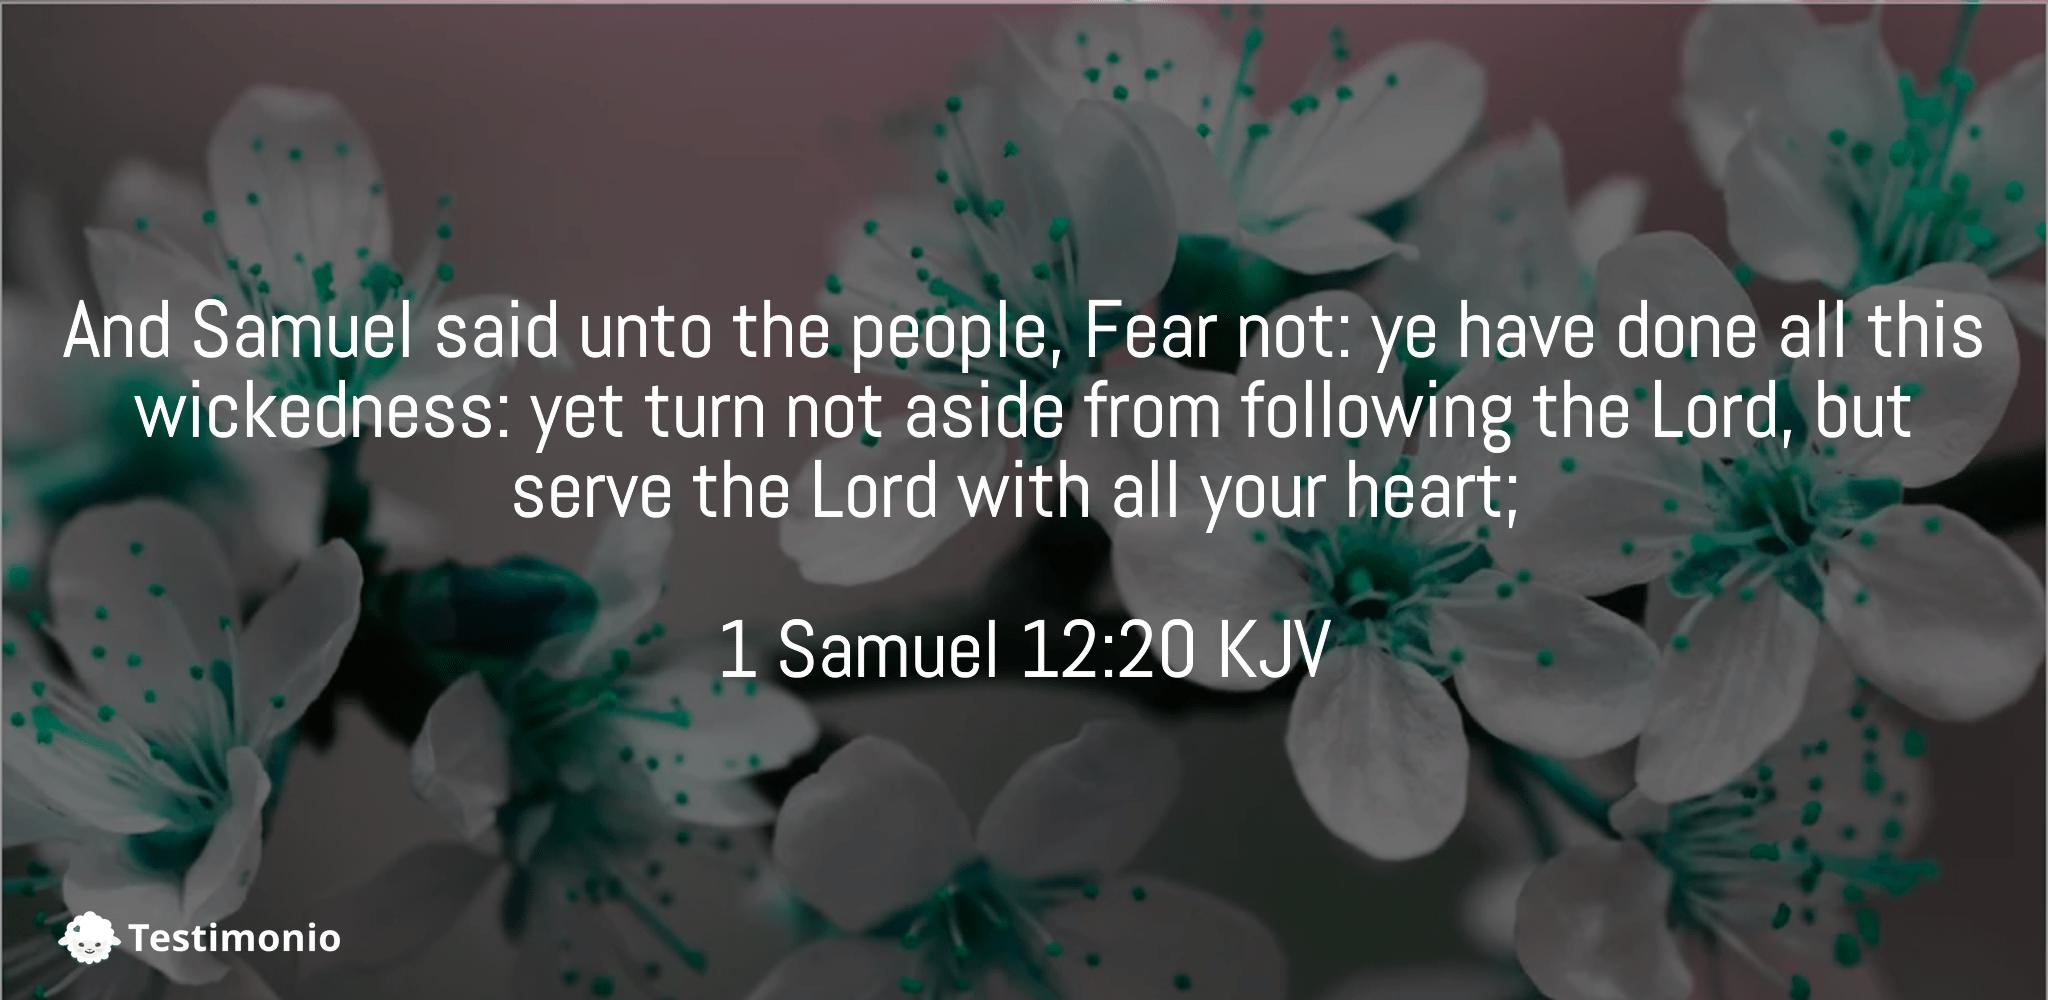 1 Samuel 12:20